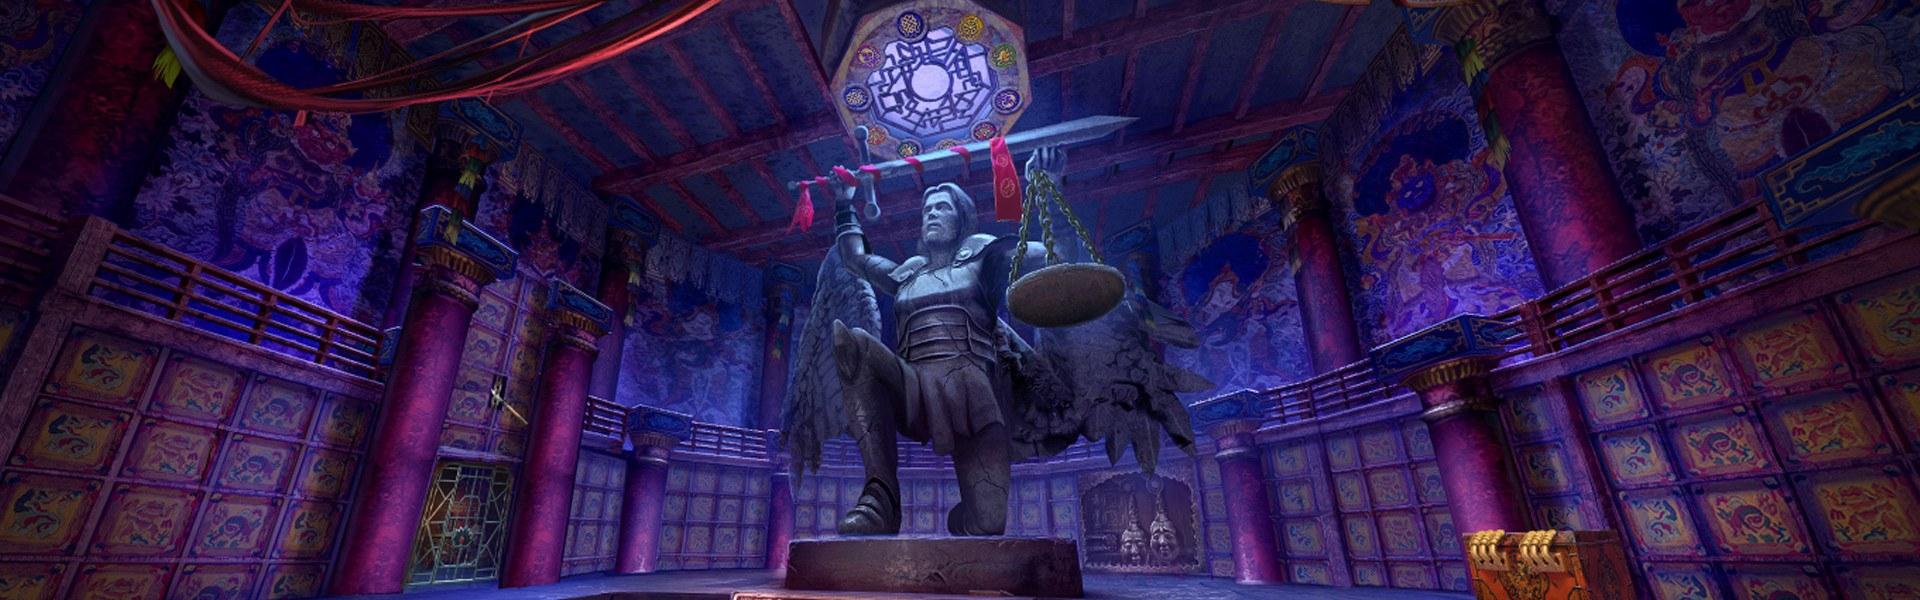 Enigmatis 3: The Shadow of Karkhala Steam Key GLOBAL